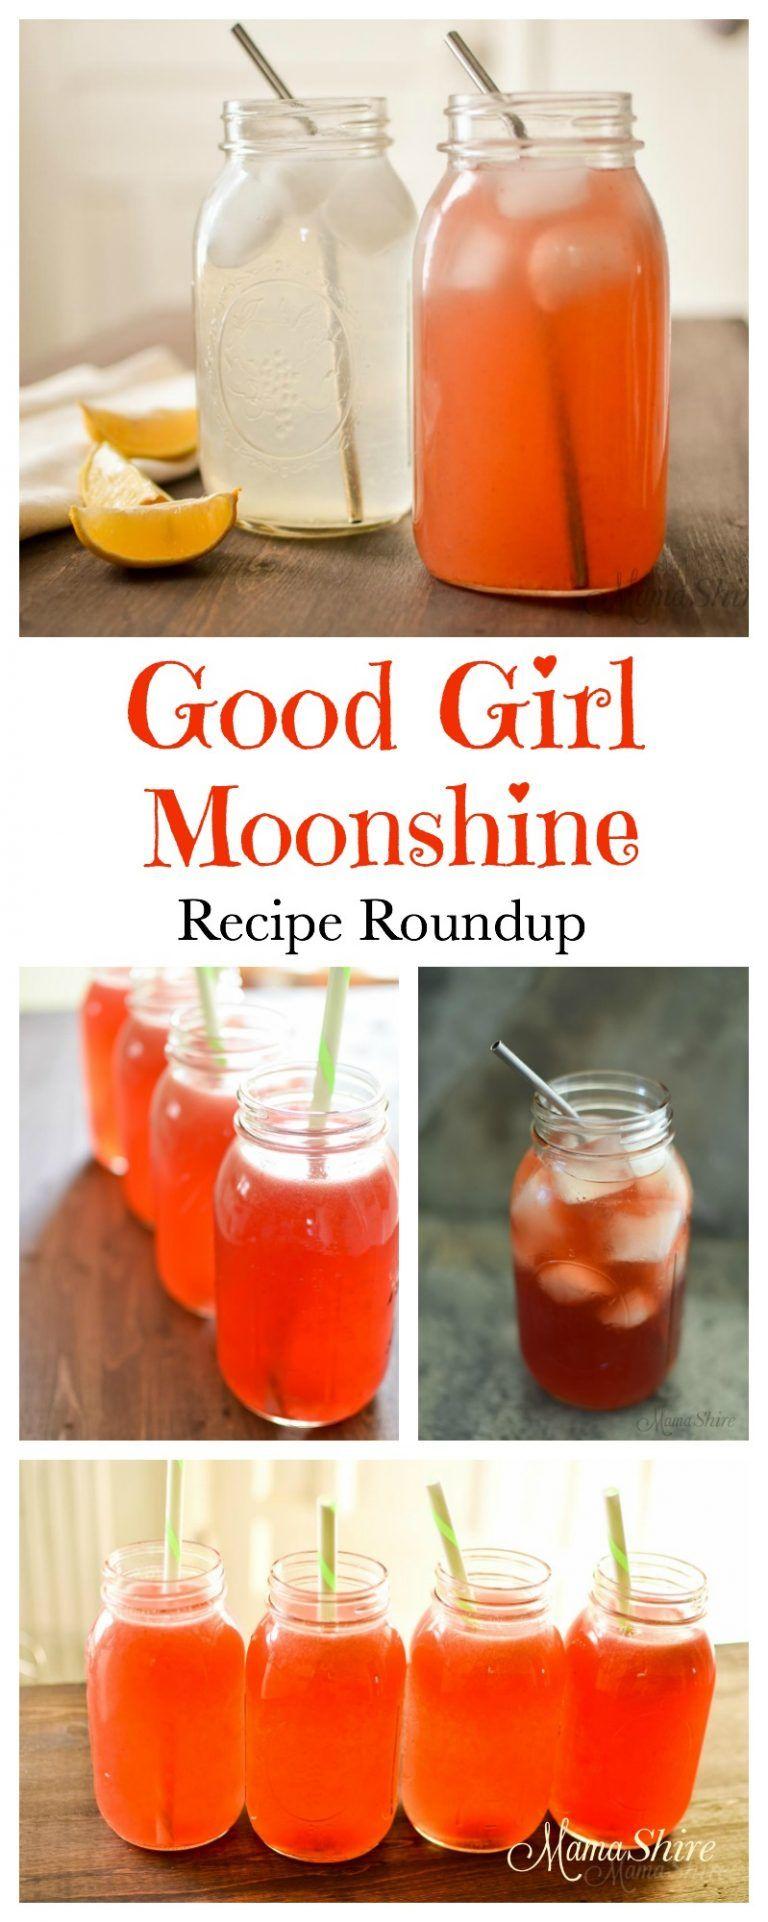 Good Girl Moonshine Recipe Roundup Trim healthy mama